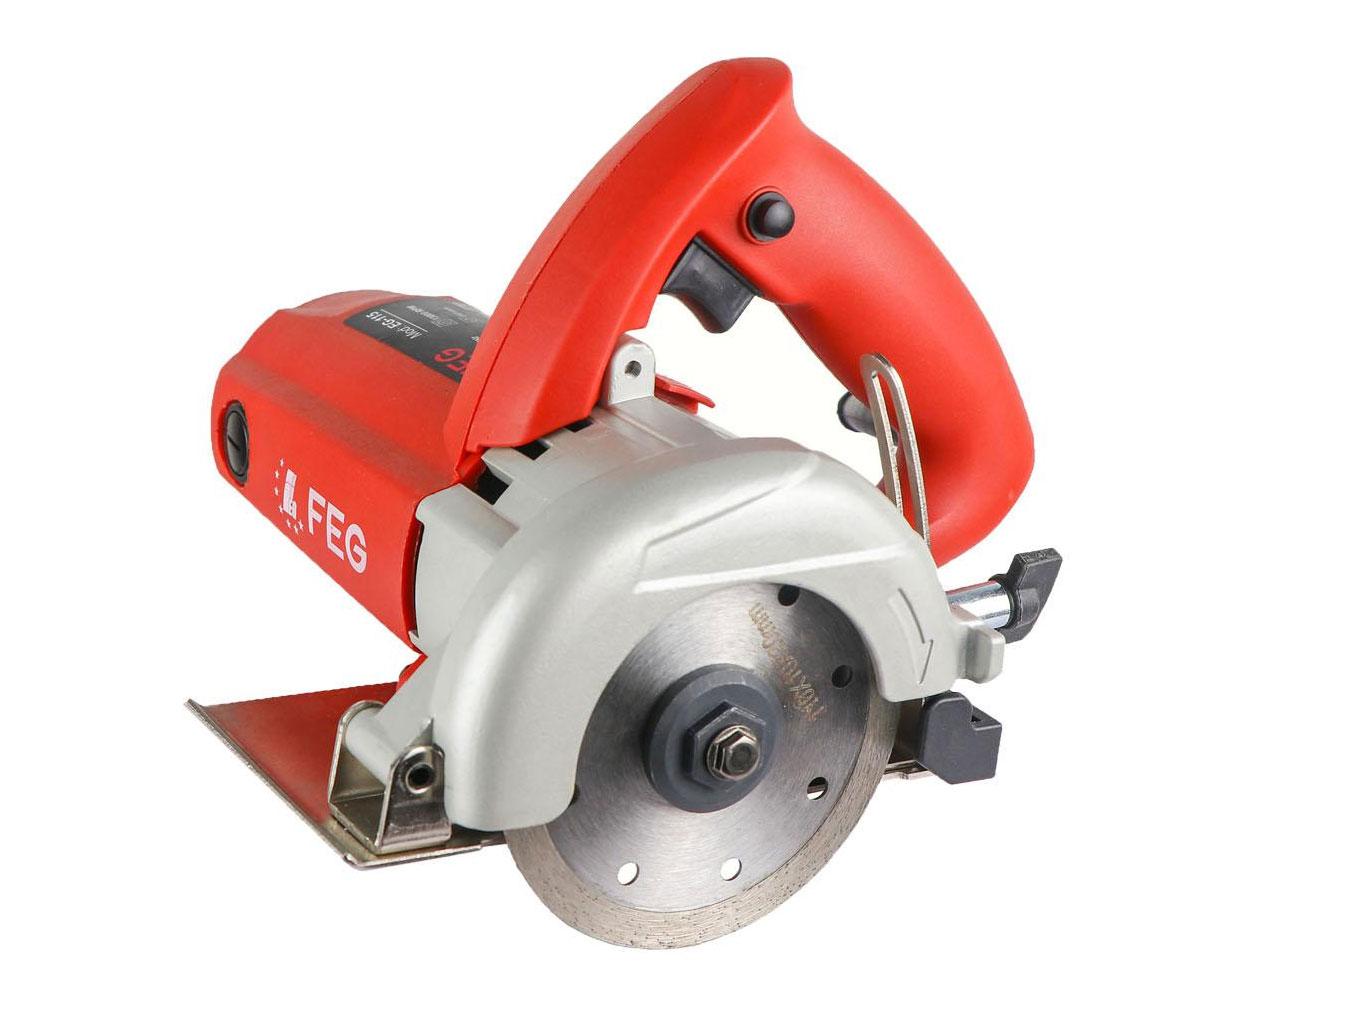 Máy cắt gạch FEG EG-115 - 110mm